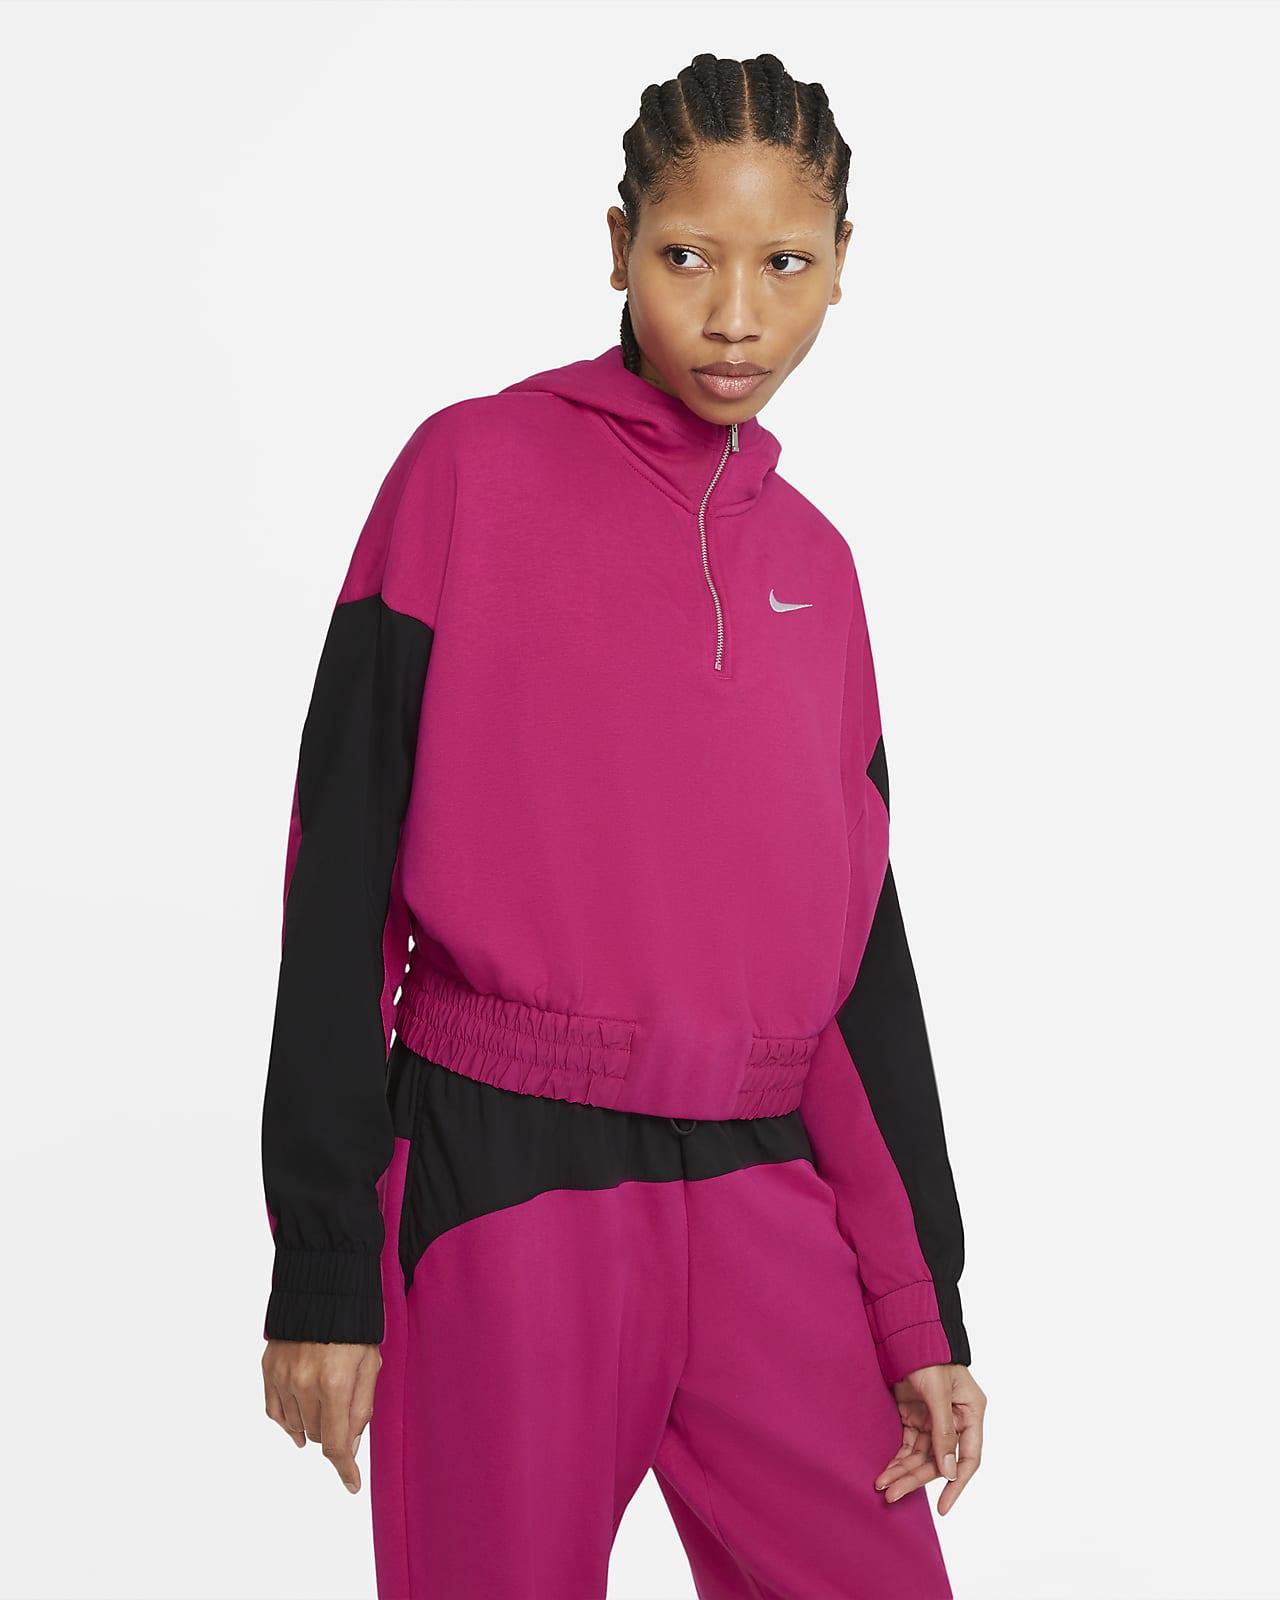 Sudadera con capucha para mujer Nike Sportswear Icon Clash